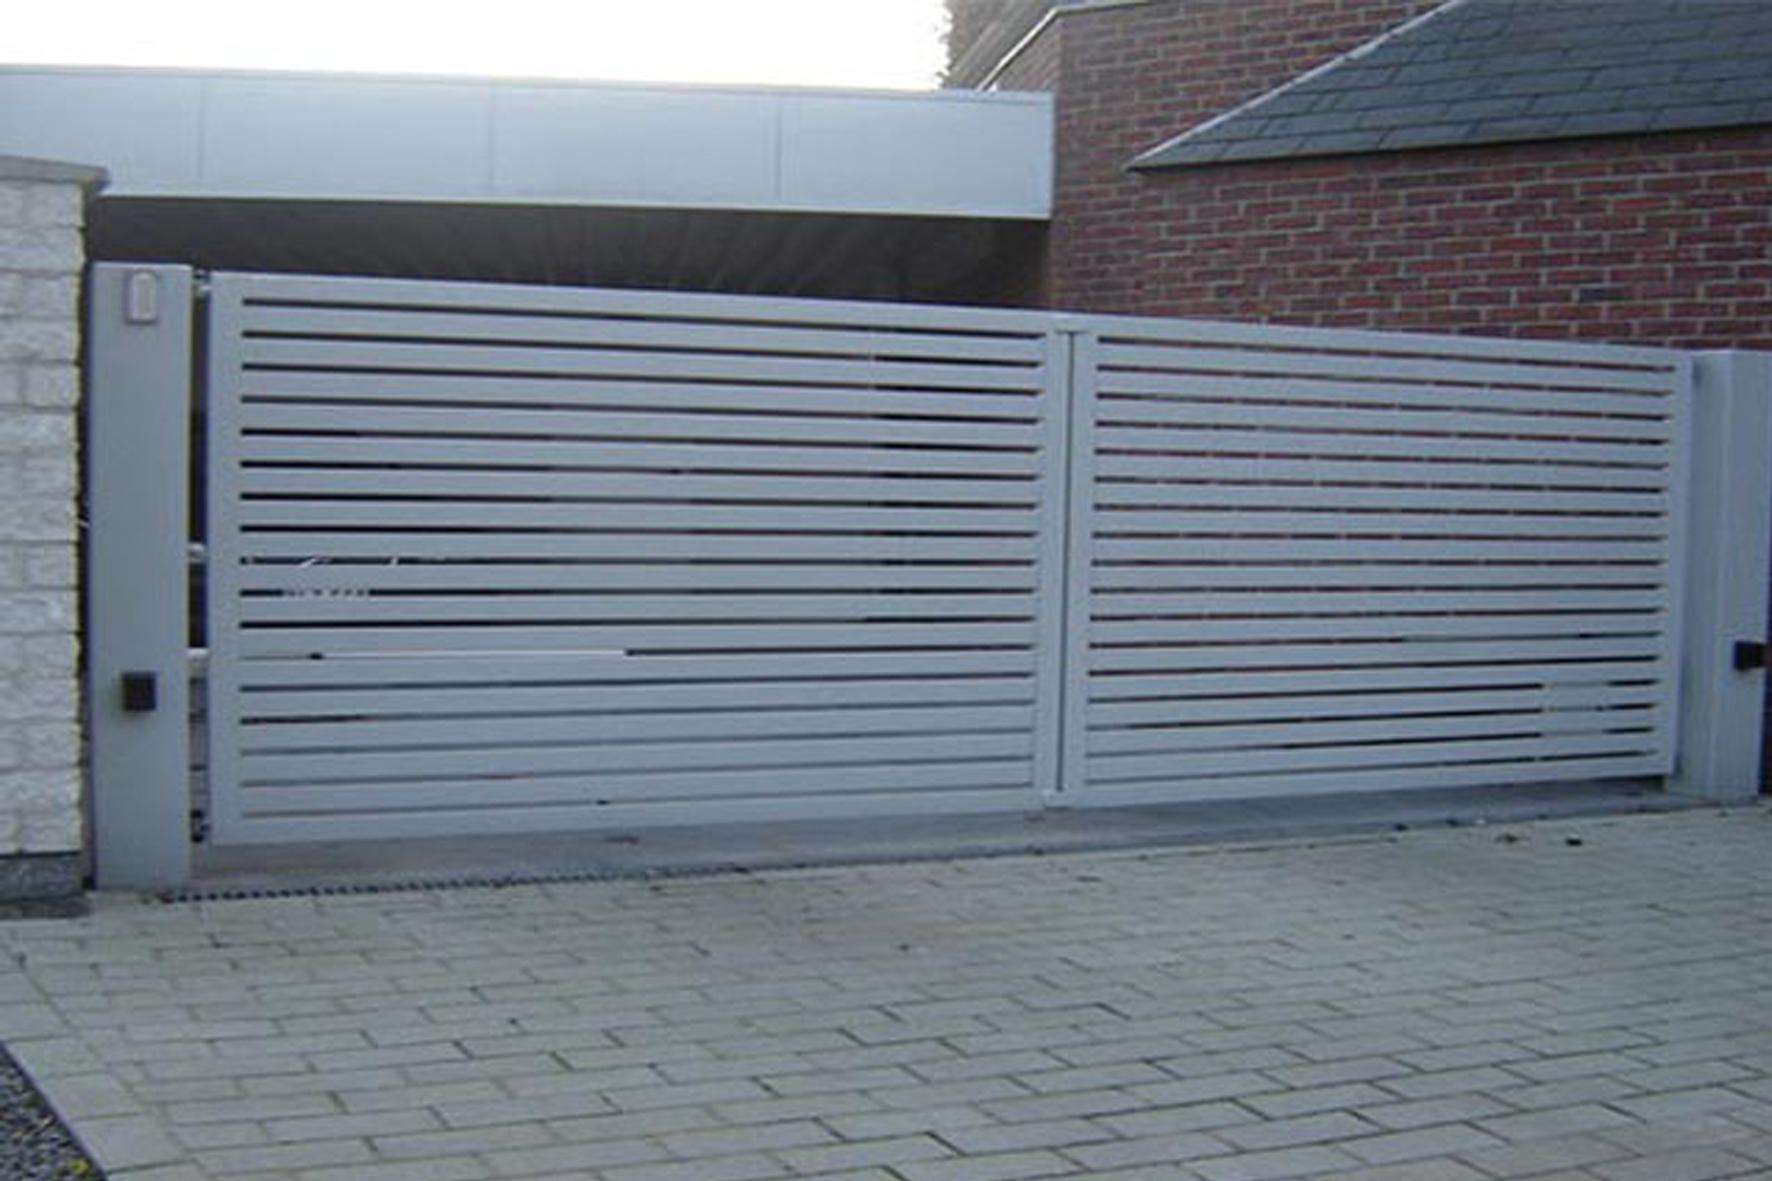 Design cloture jardin bekaert 2723 cloture beton for Cloture portail